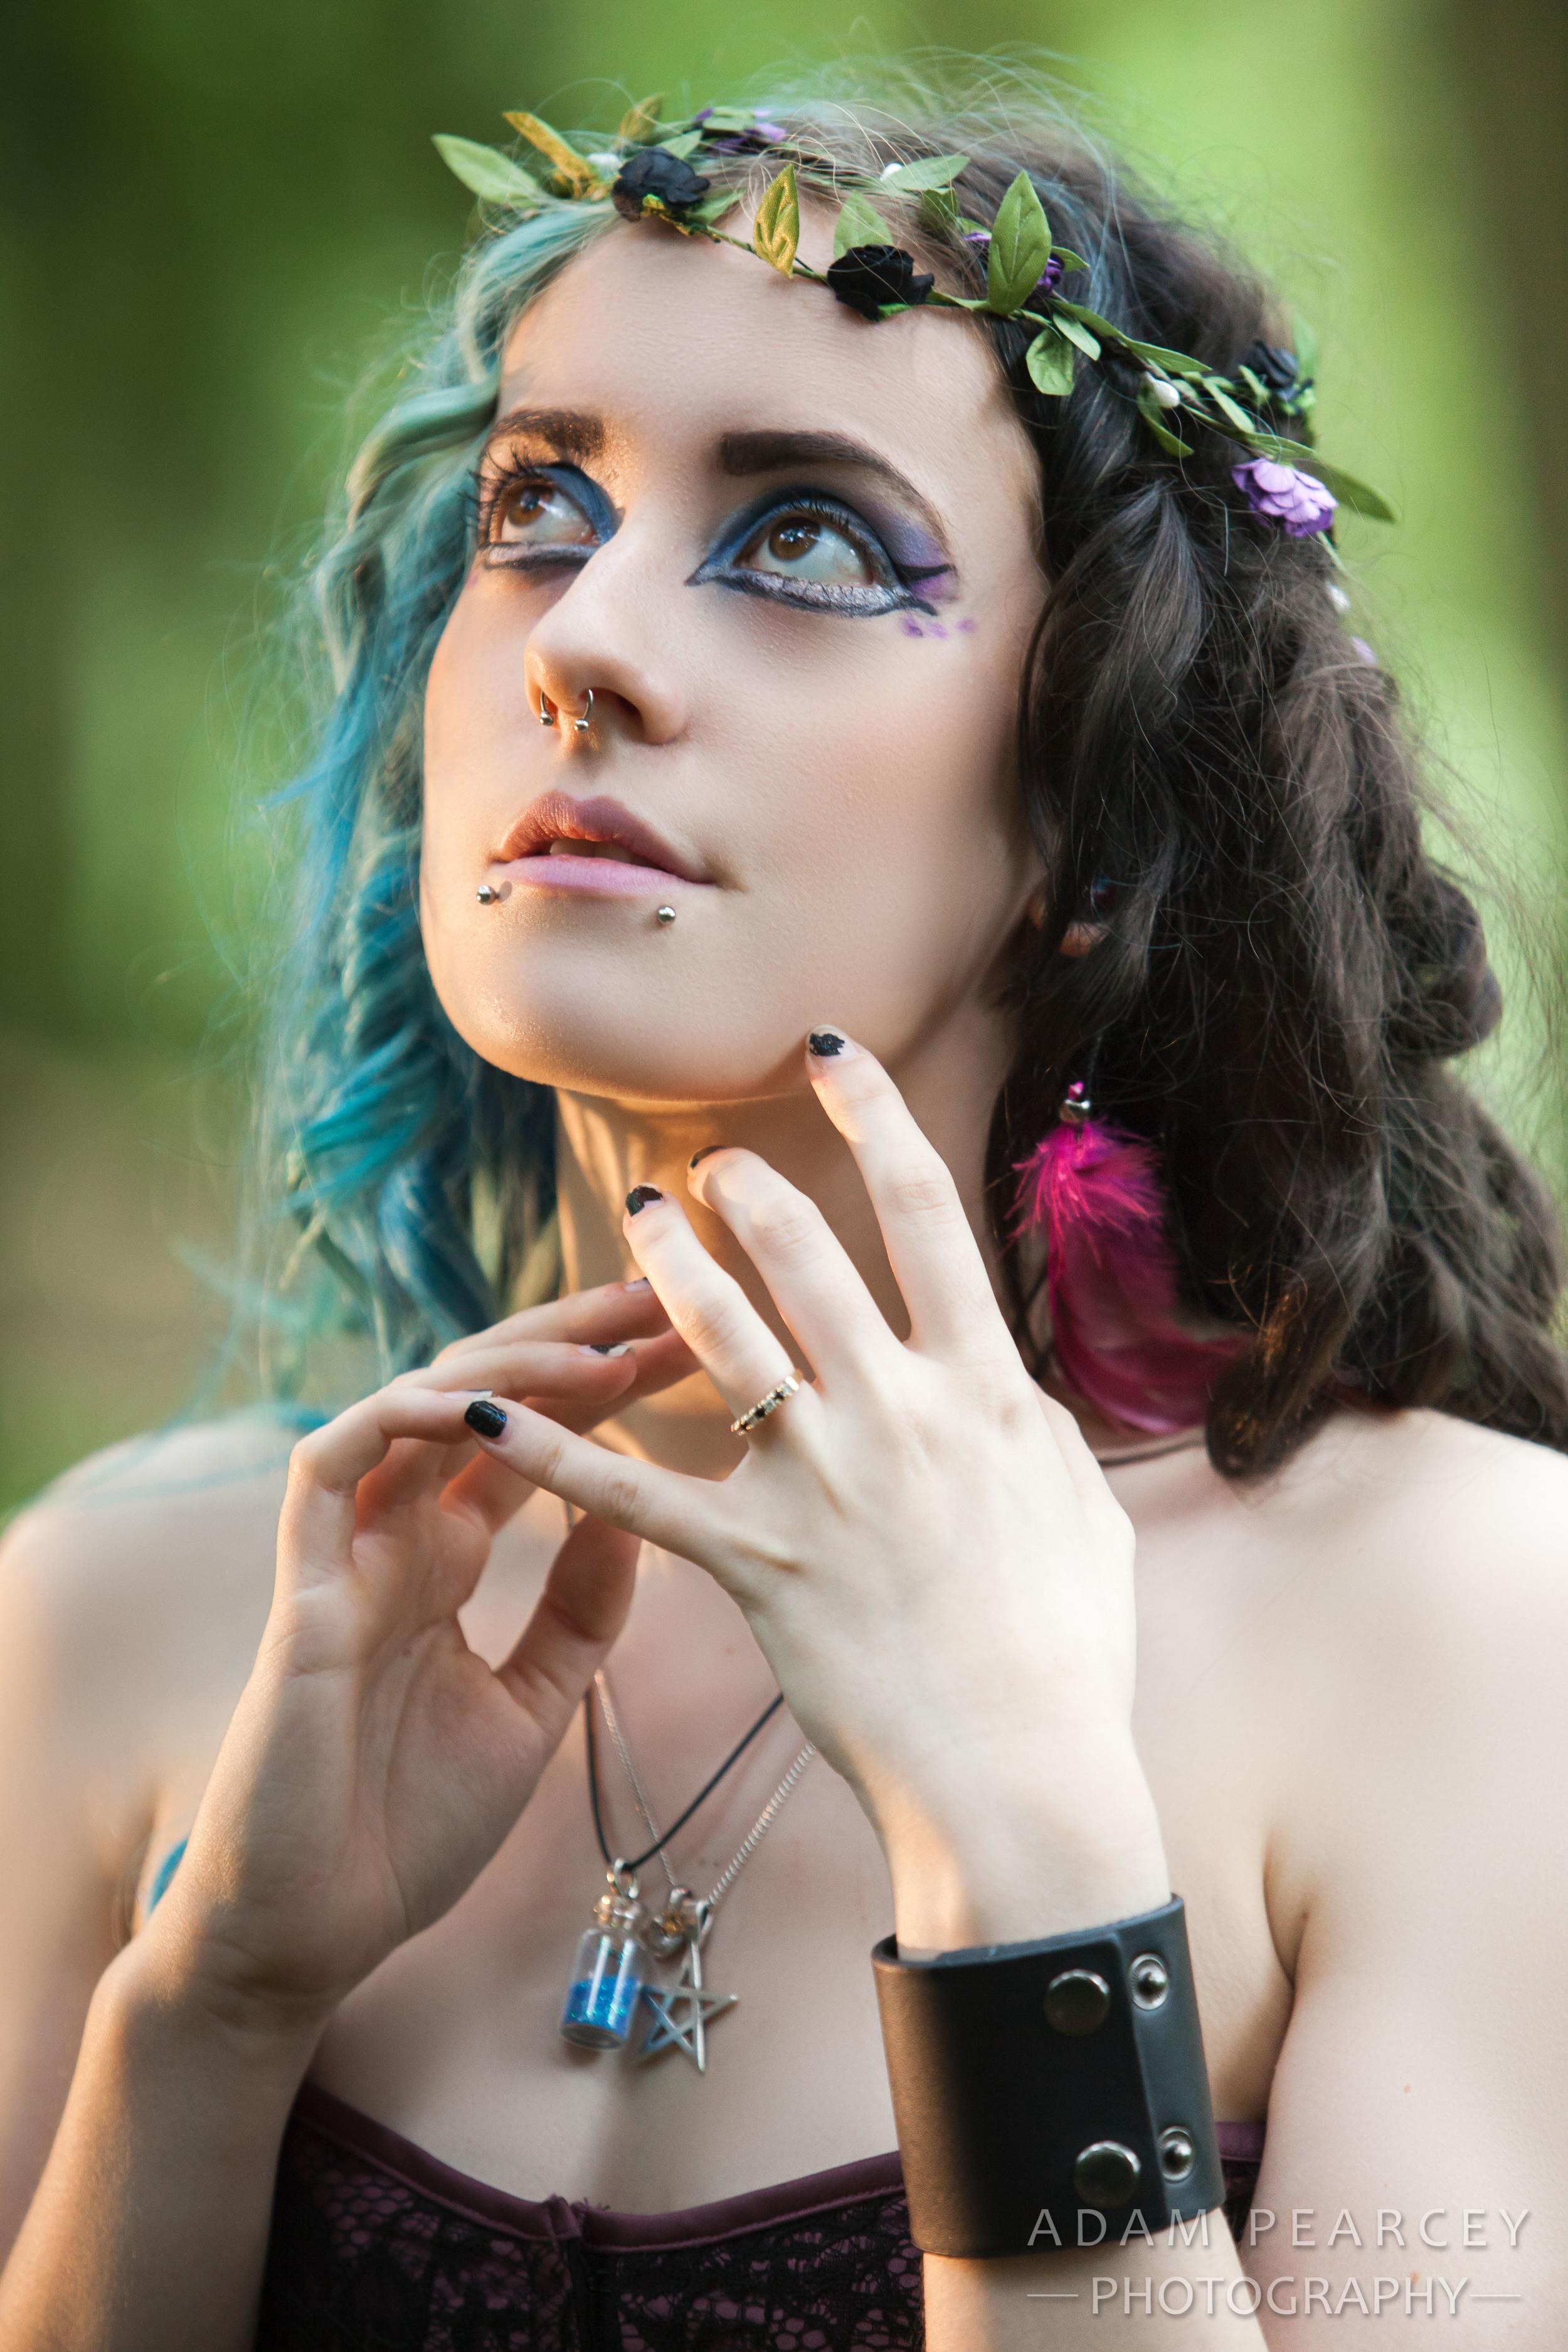 alternative-model-smooth-skin-posed-woods-wilderness-hair-headband.jpg